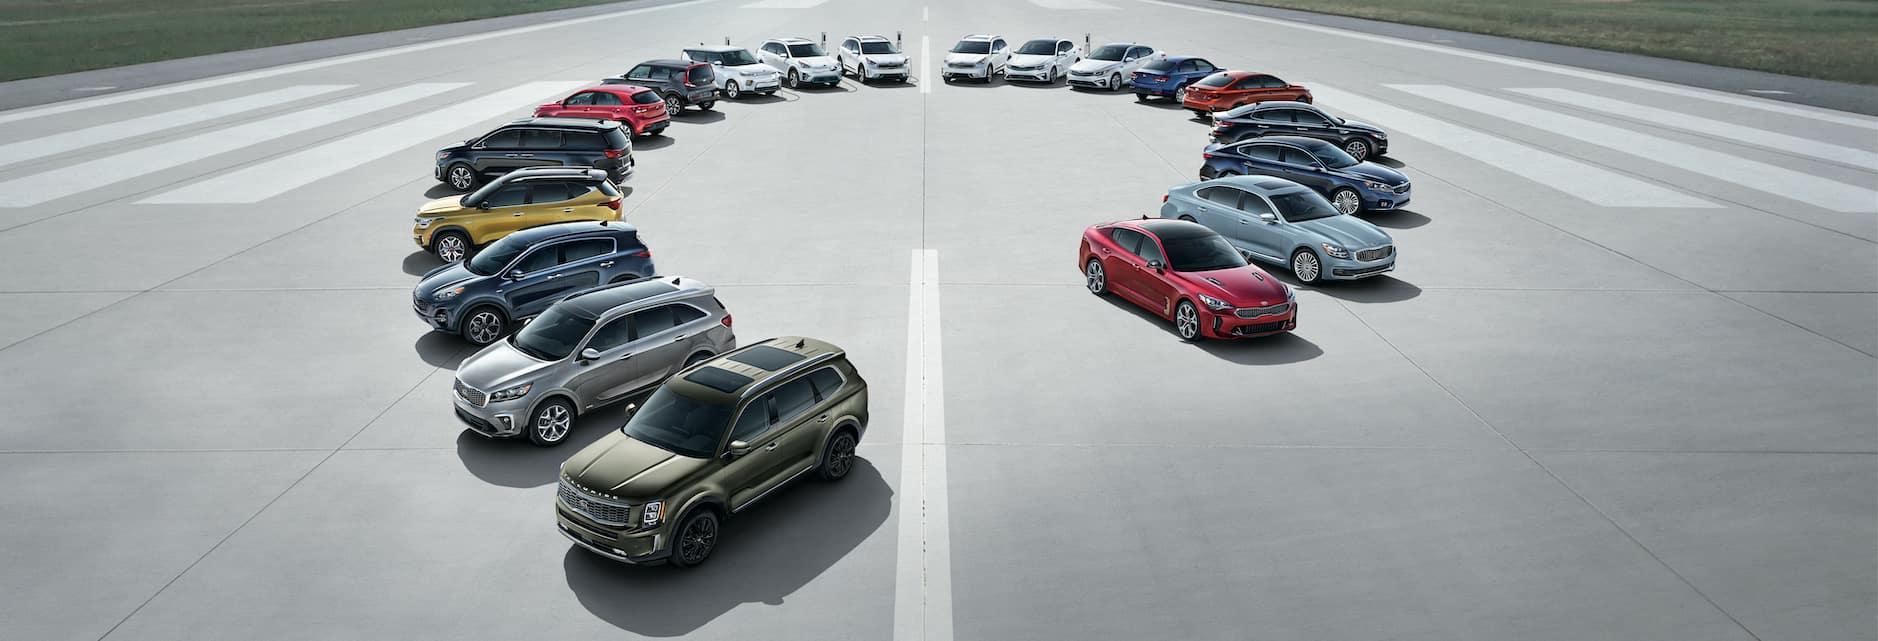 Kia Vehicles Full Line Up